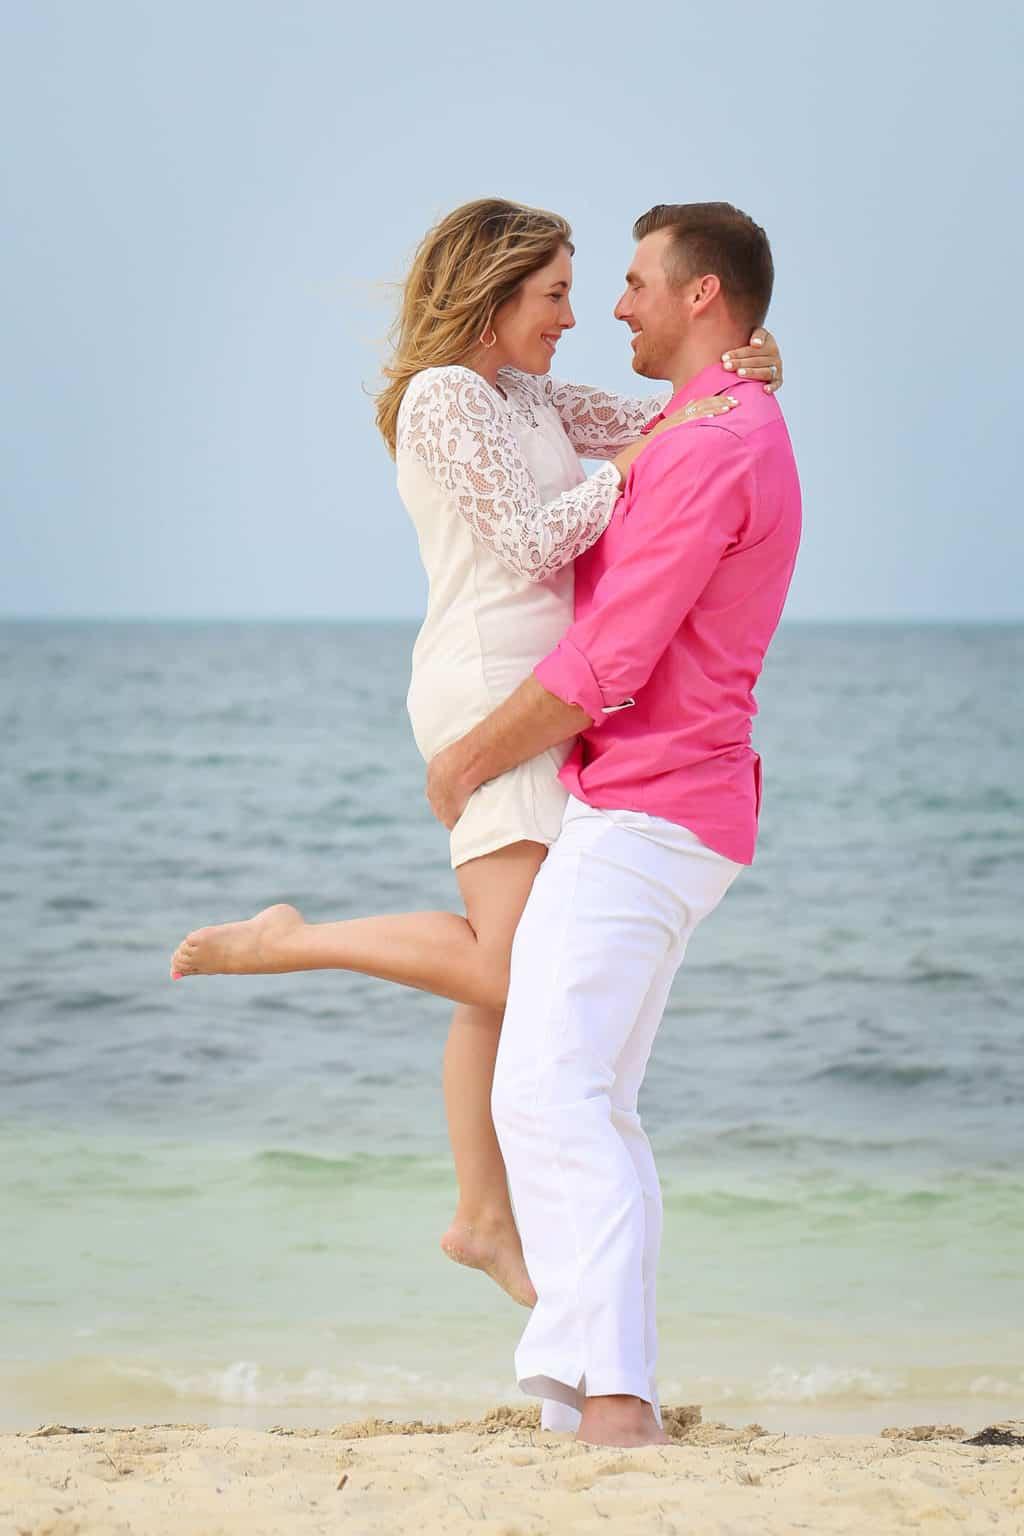 wearing white for beach photos as a couple